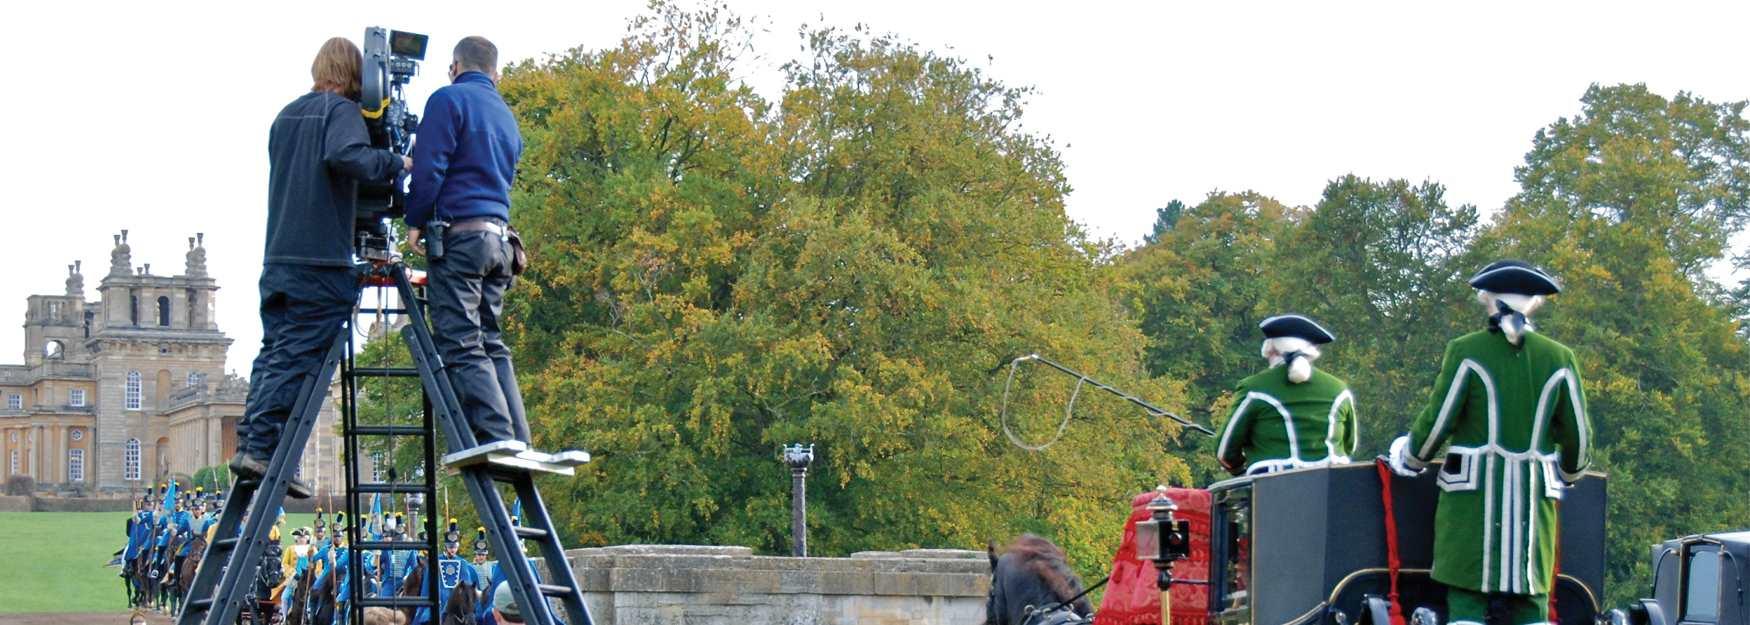 Filming Cinderella at Blenheim Palace